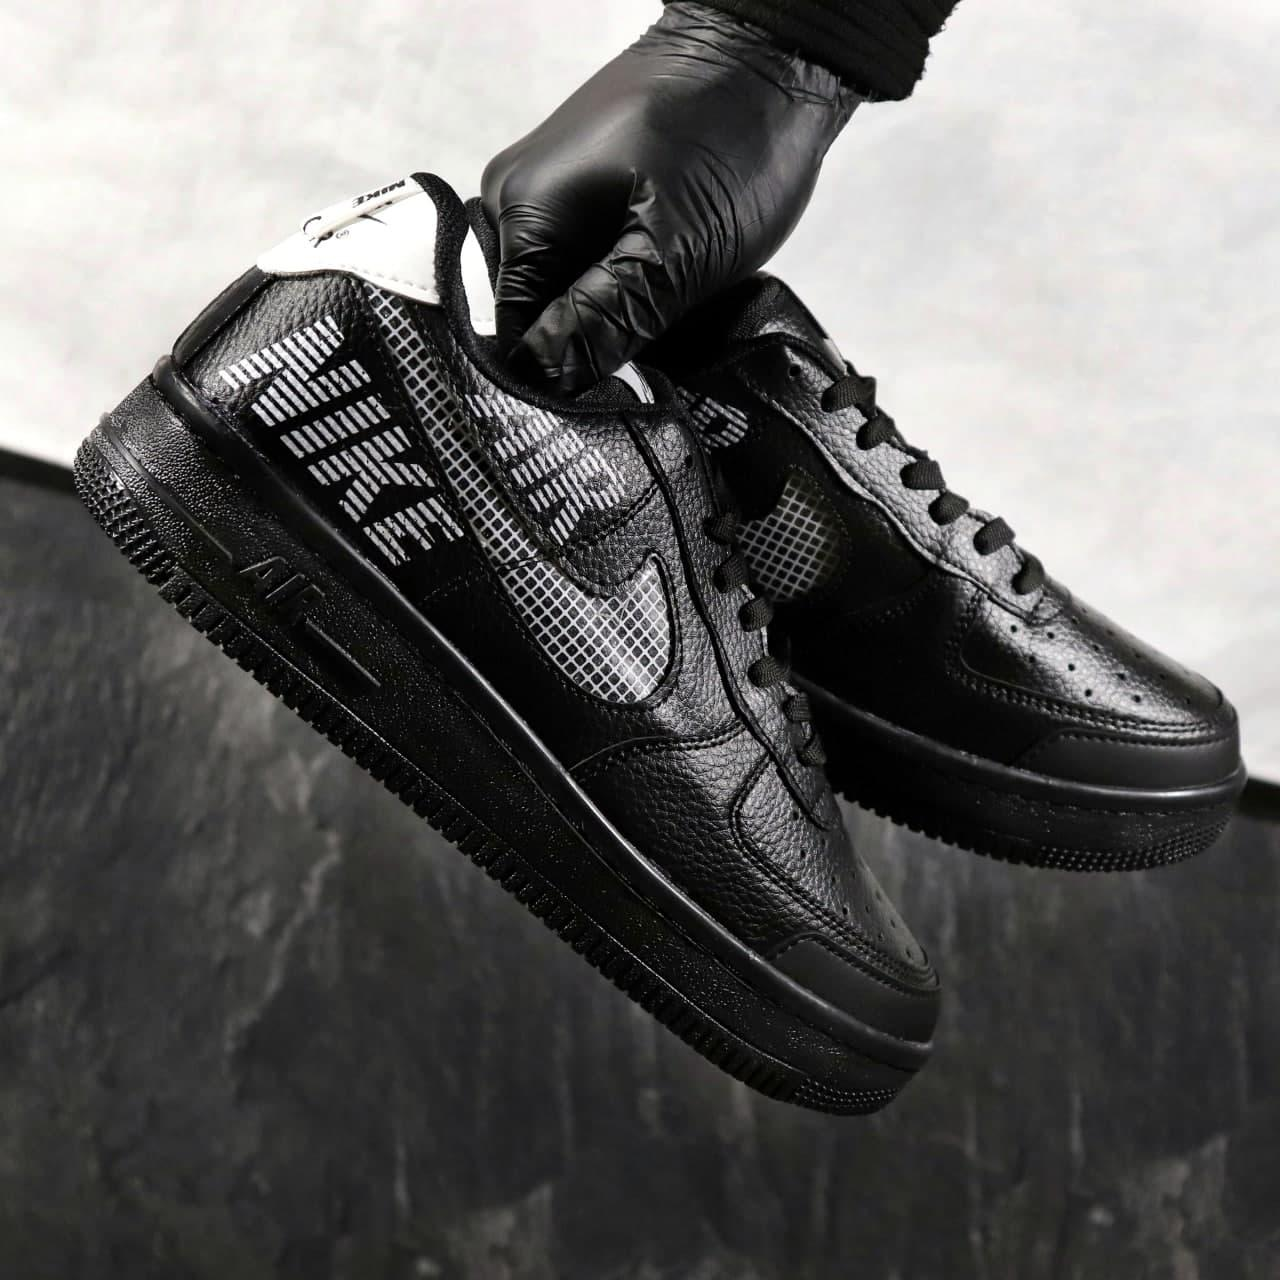 Кроссовки Air Force 1 Low LV8 2 Black Edition